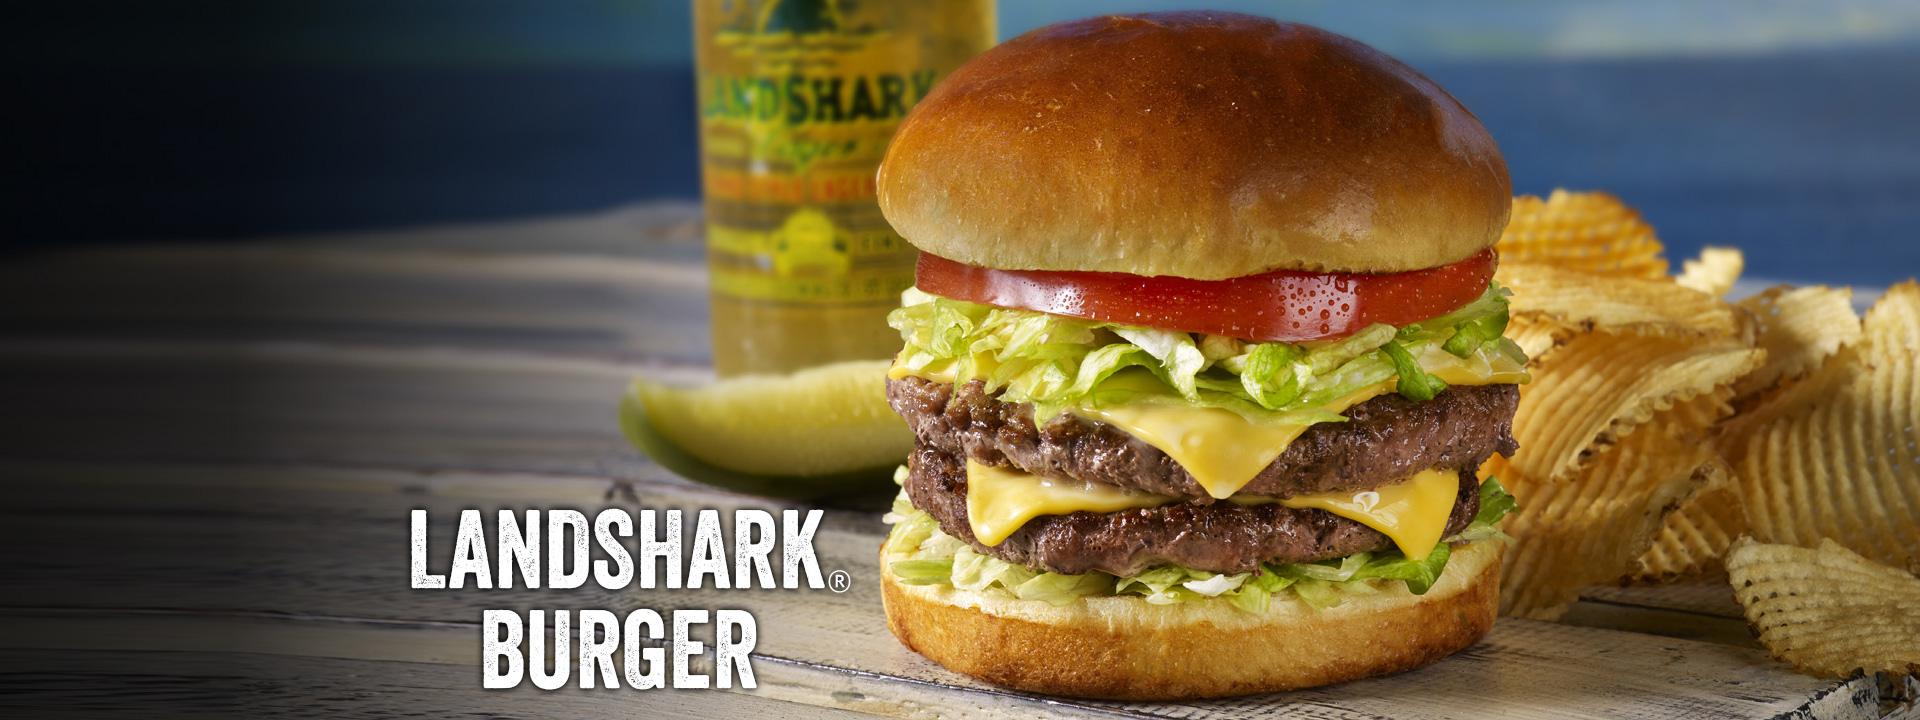 landshark_burger.jpg